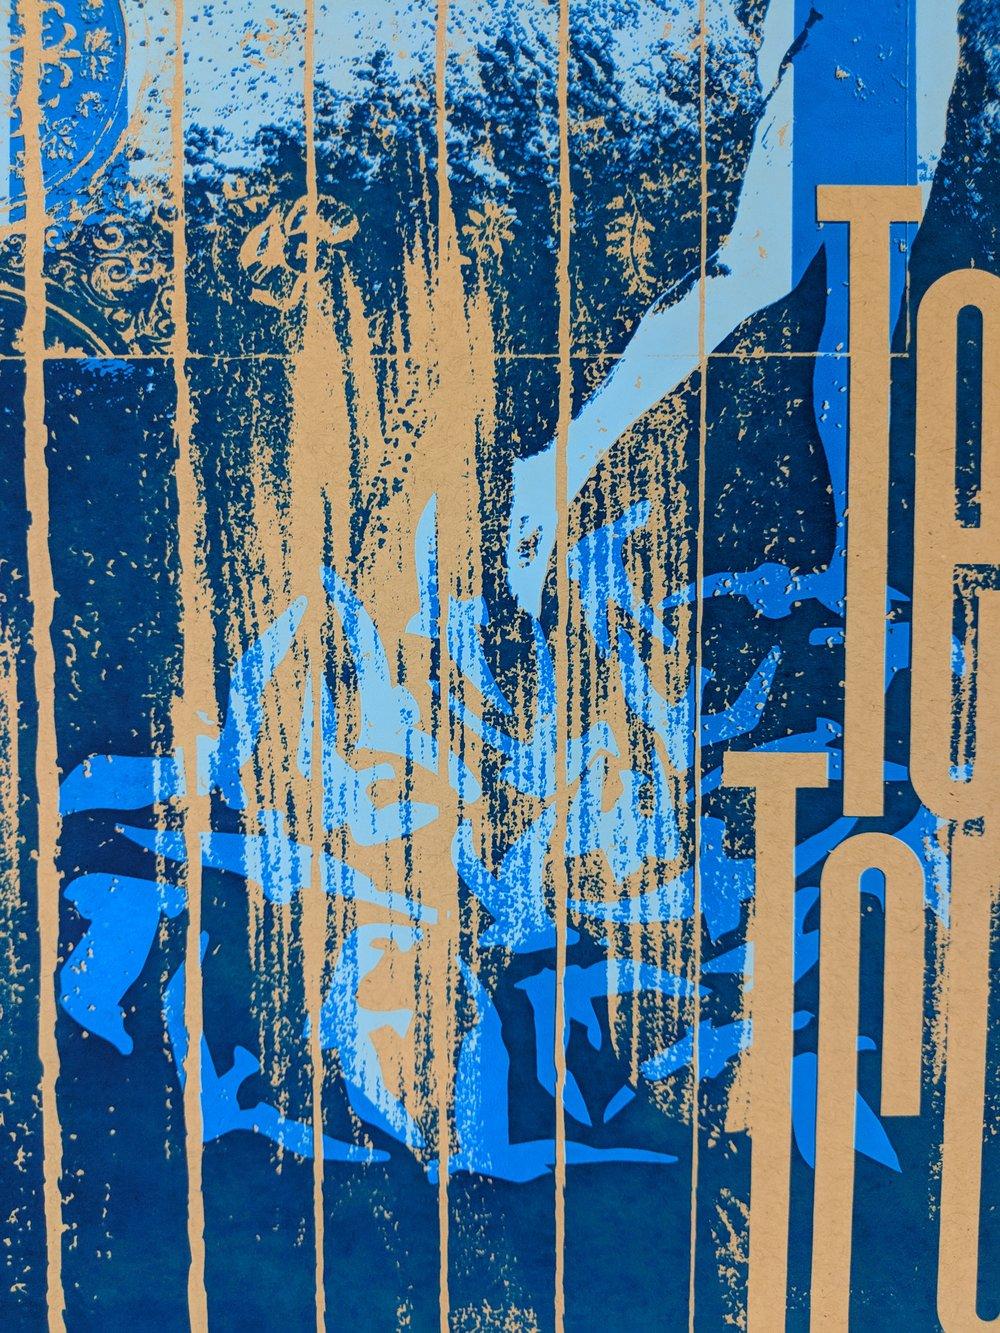 Tedeschi Trucks Band, Asheville, NC. Thomas Wolfe Auditorium, 2019